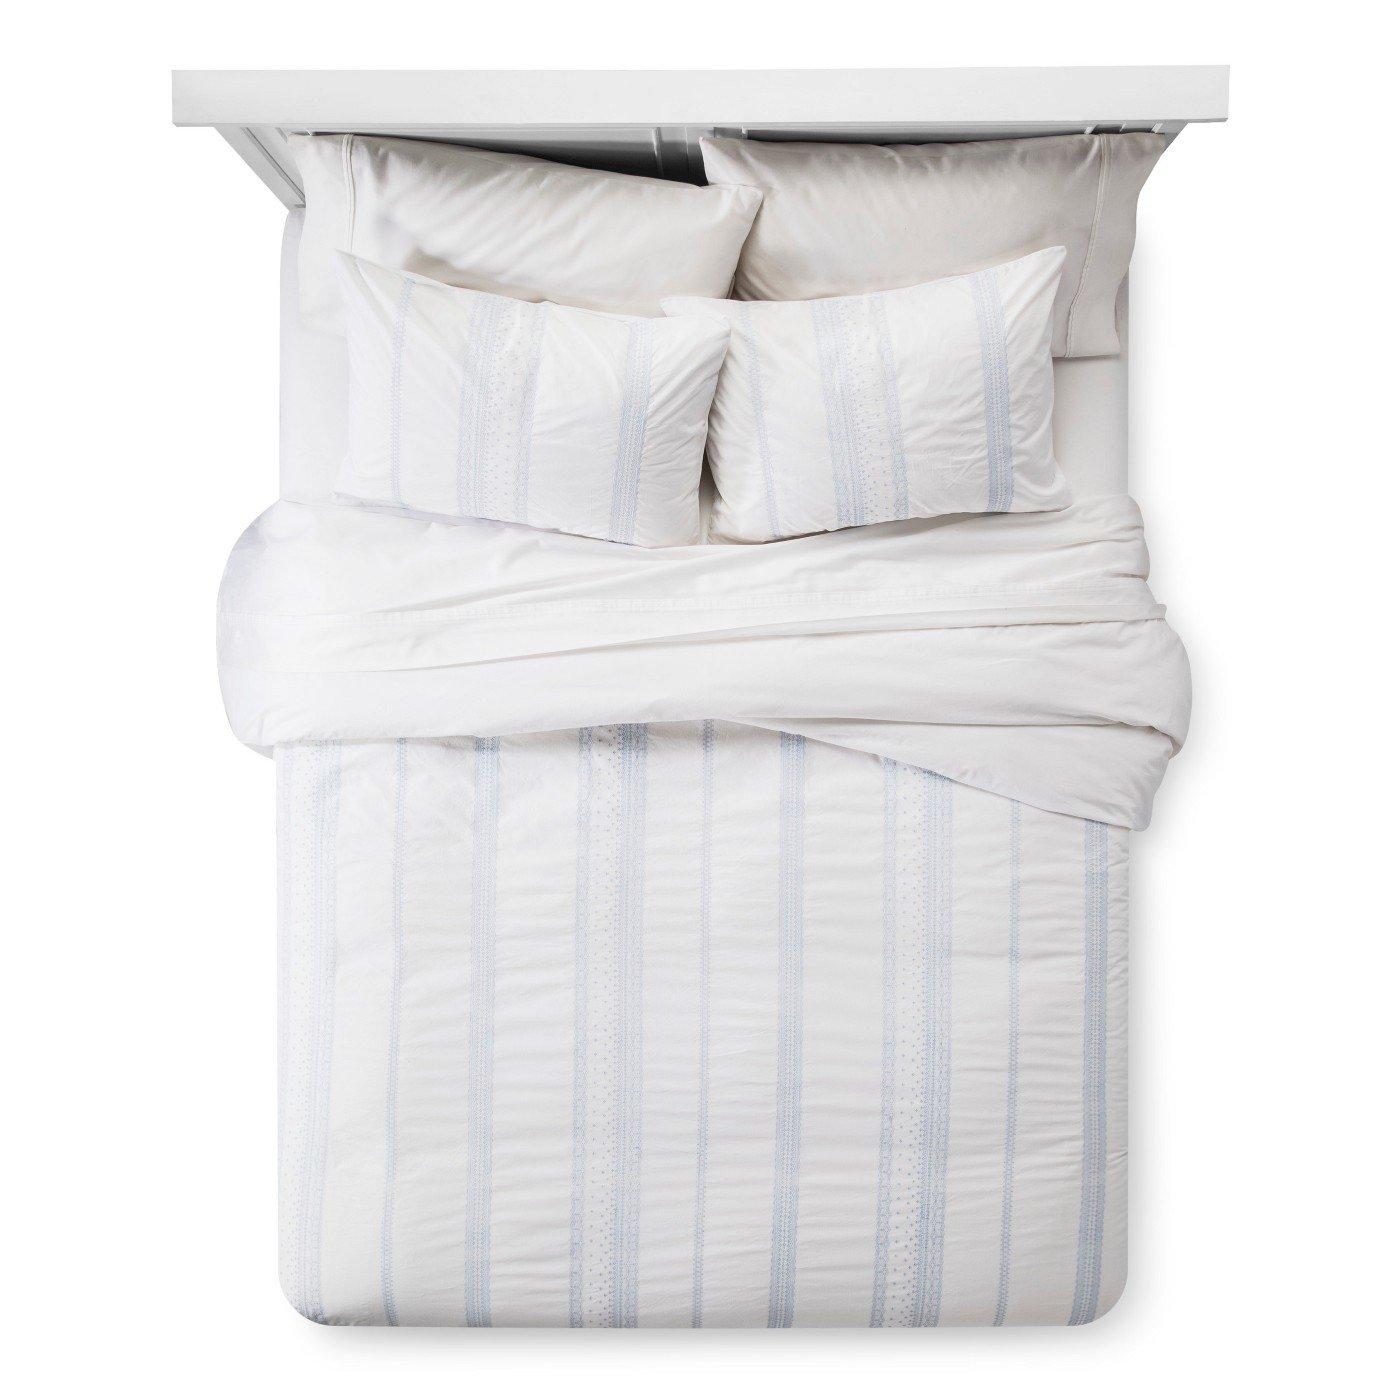 Simply Shabby Chicボヘミアンホワイト&ブルー刺繍3ピースコットン布団カバー&枕カバーセット、キング B07BDHG9ZF